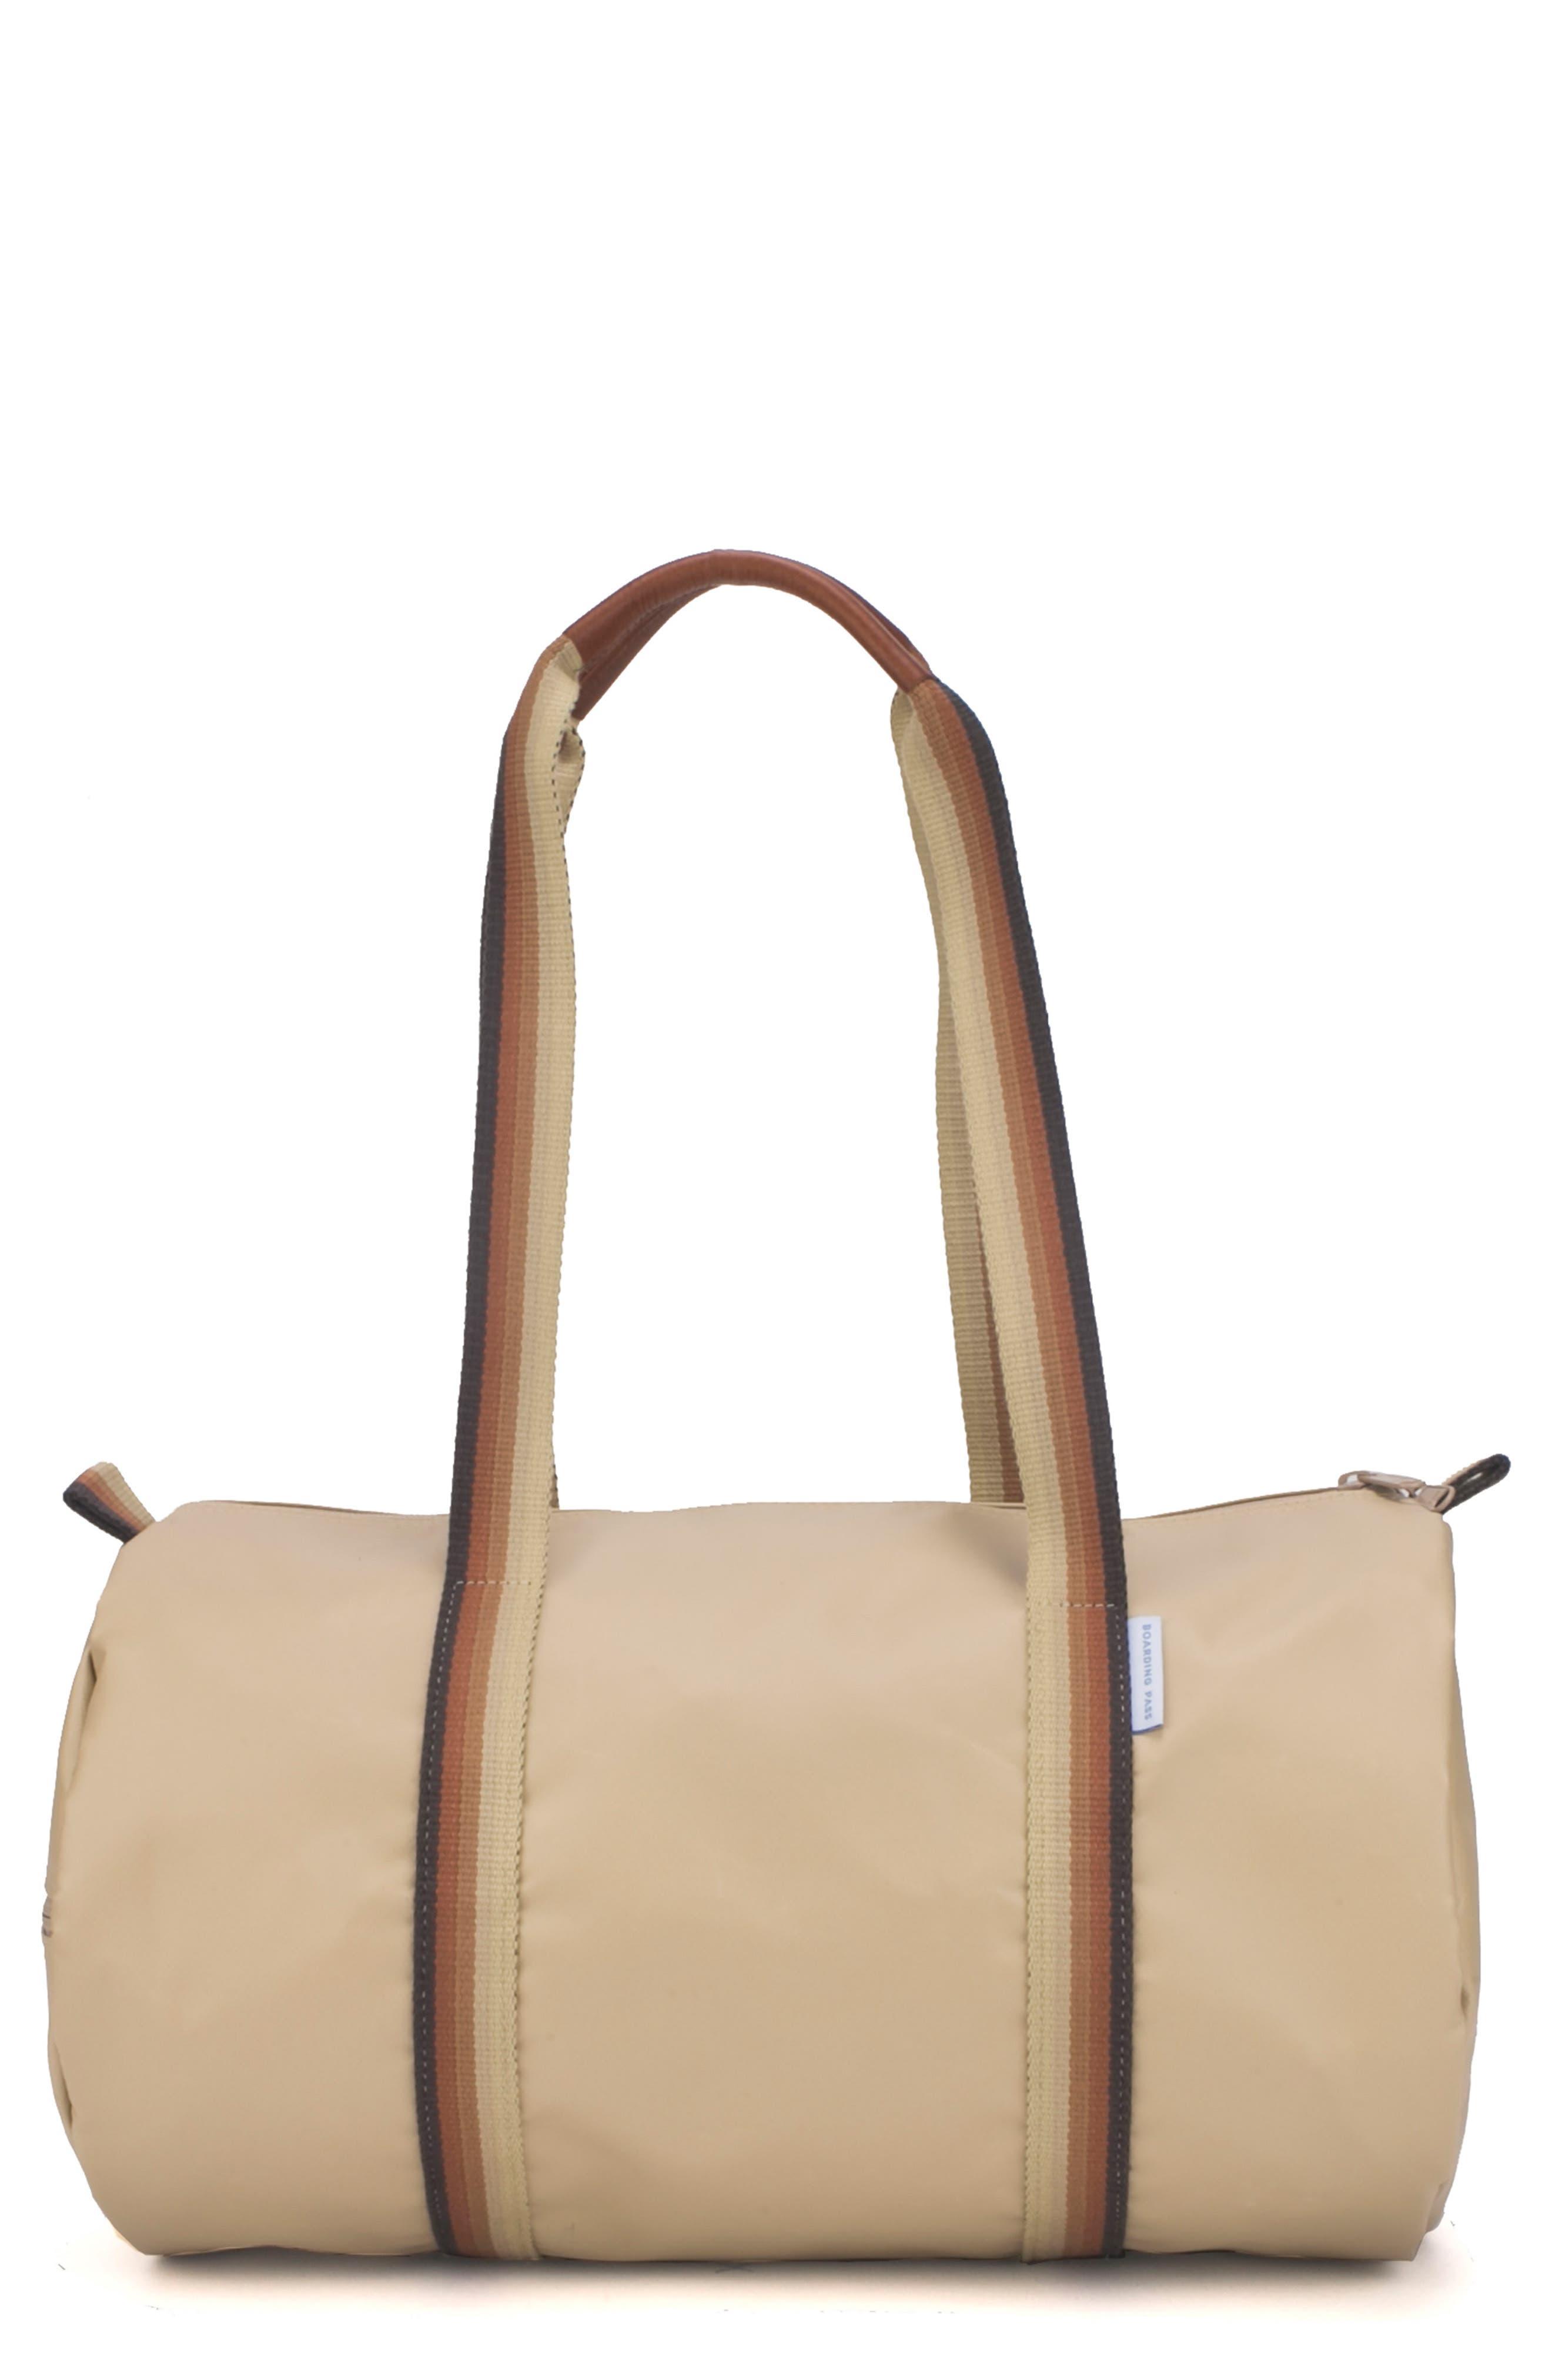 BOARDING PASS Lifestyle Duffel Bag - Brown in Tan